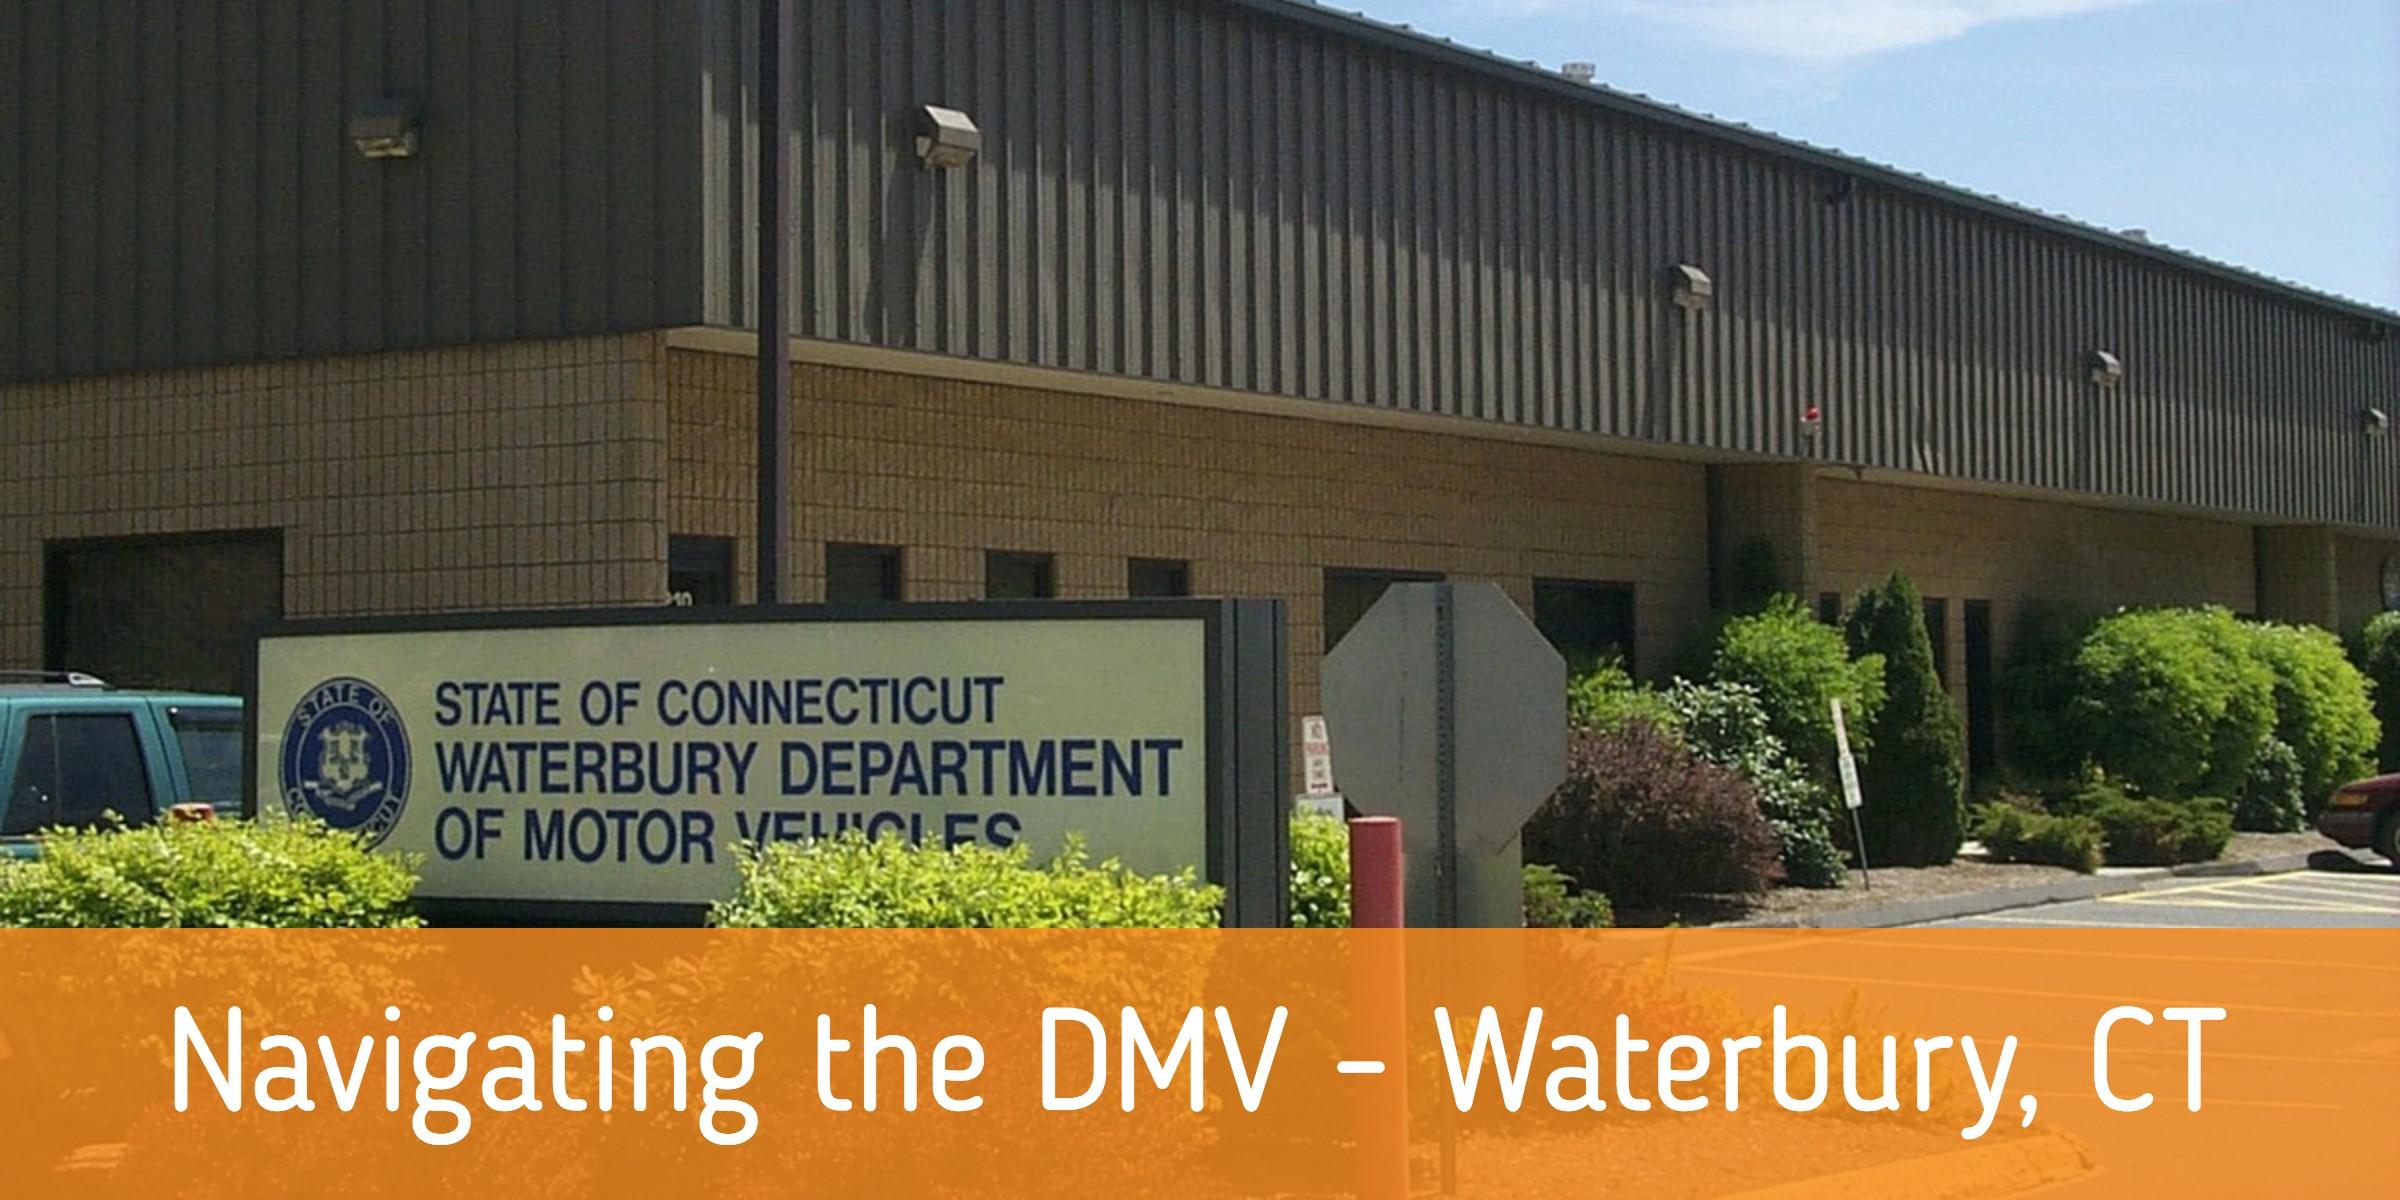 Navigating_the_DMV_-_Waterbury_CT.jpg